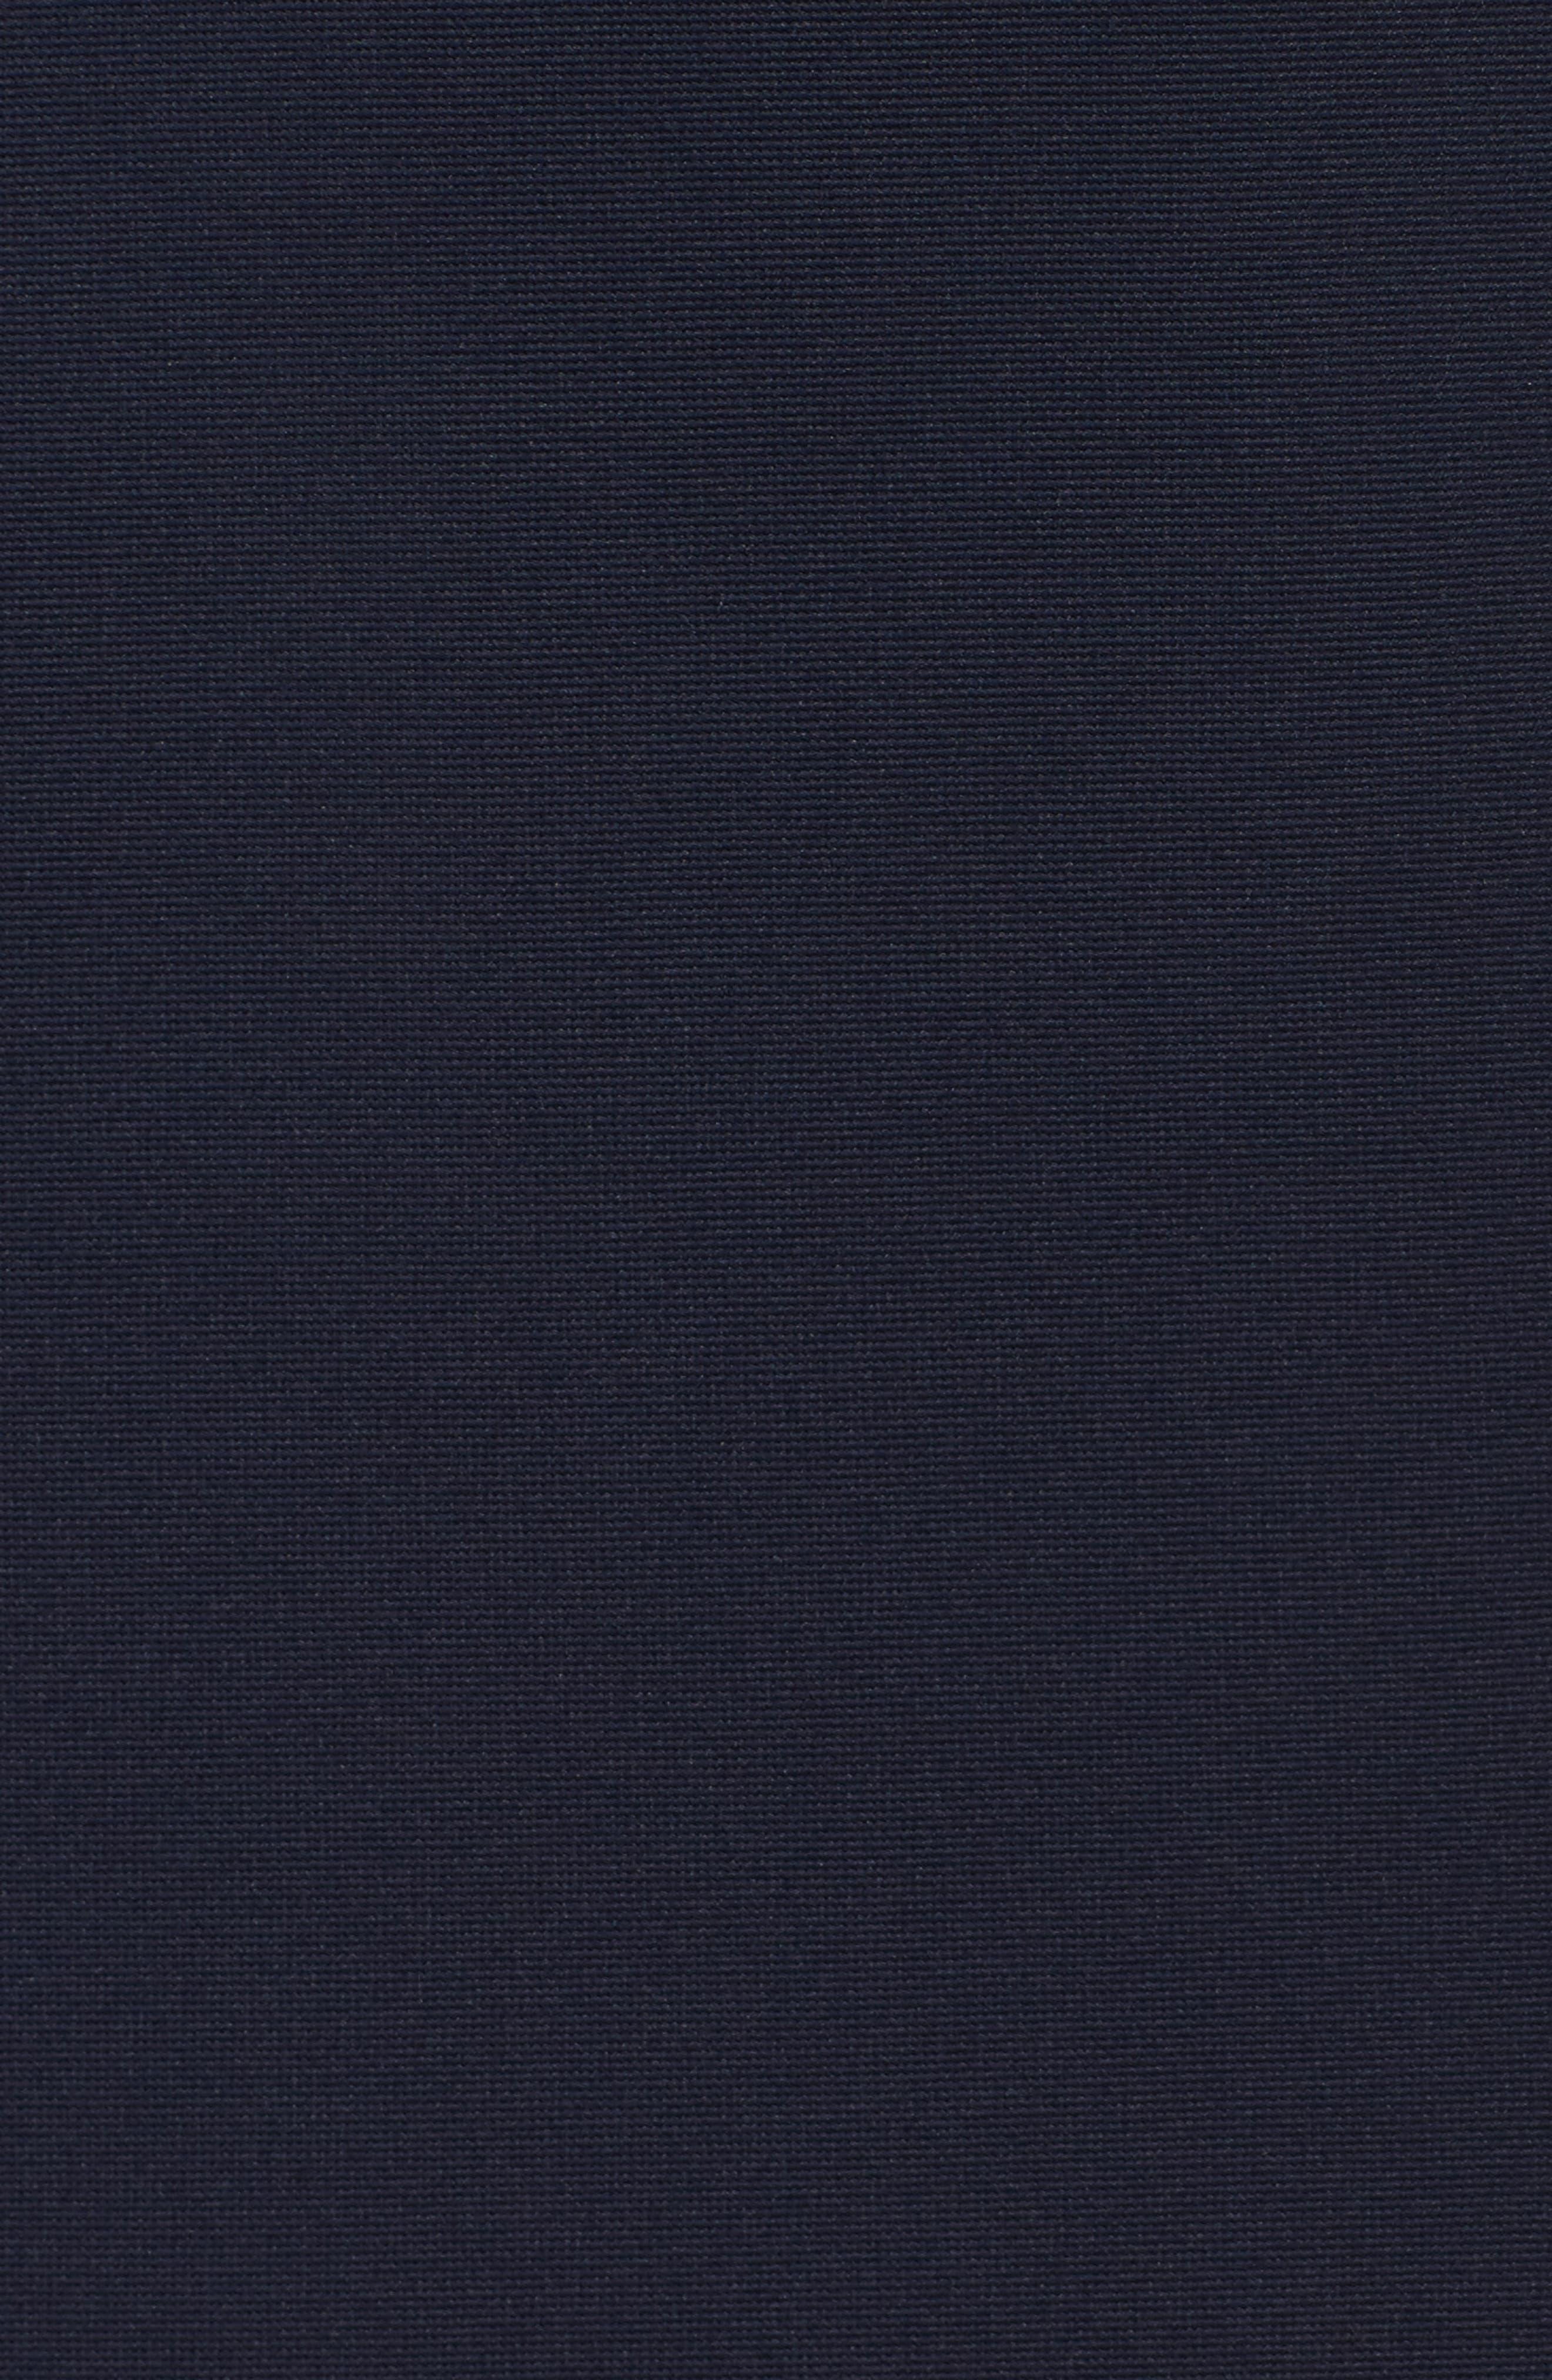 Popover Lace Gown,                             Alternate thumbnail 5, color,                             410